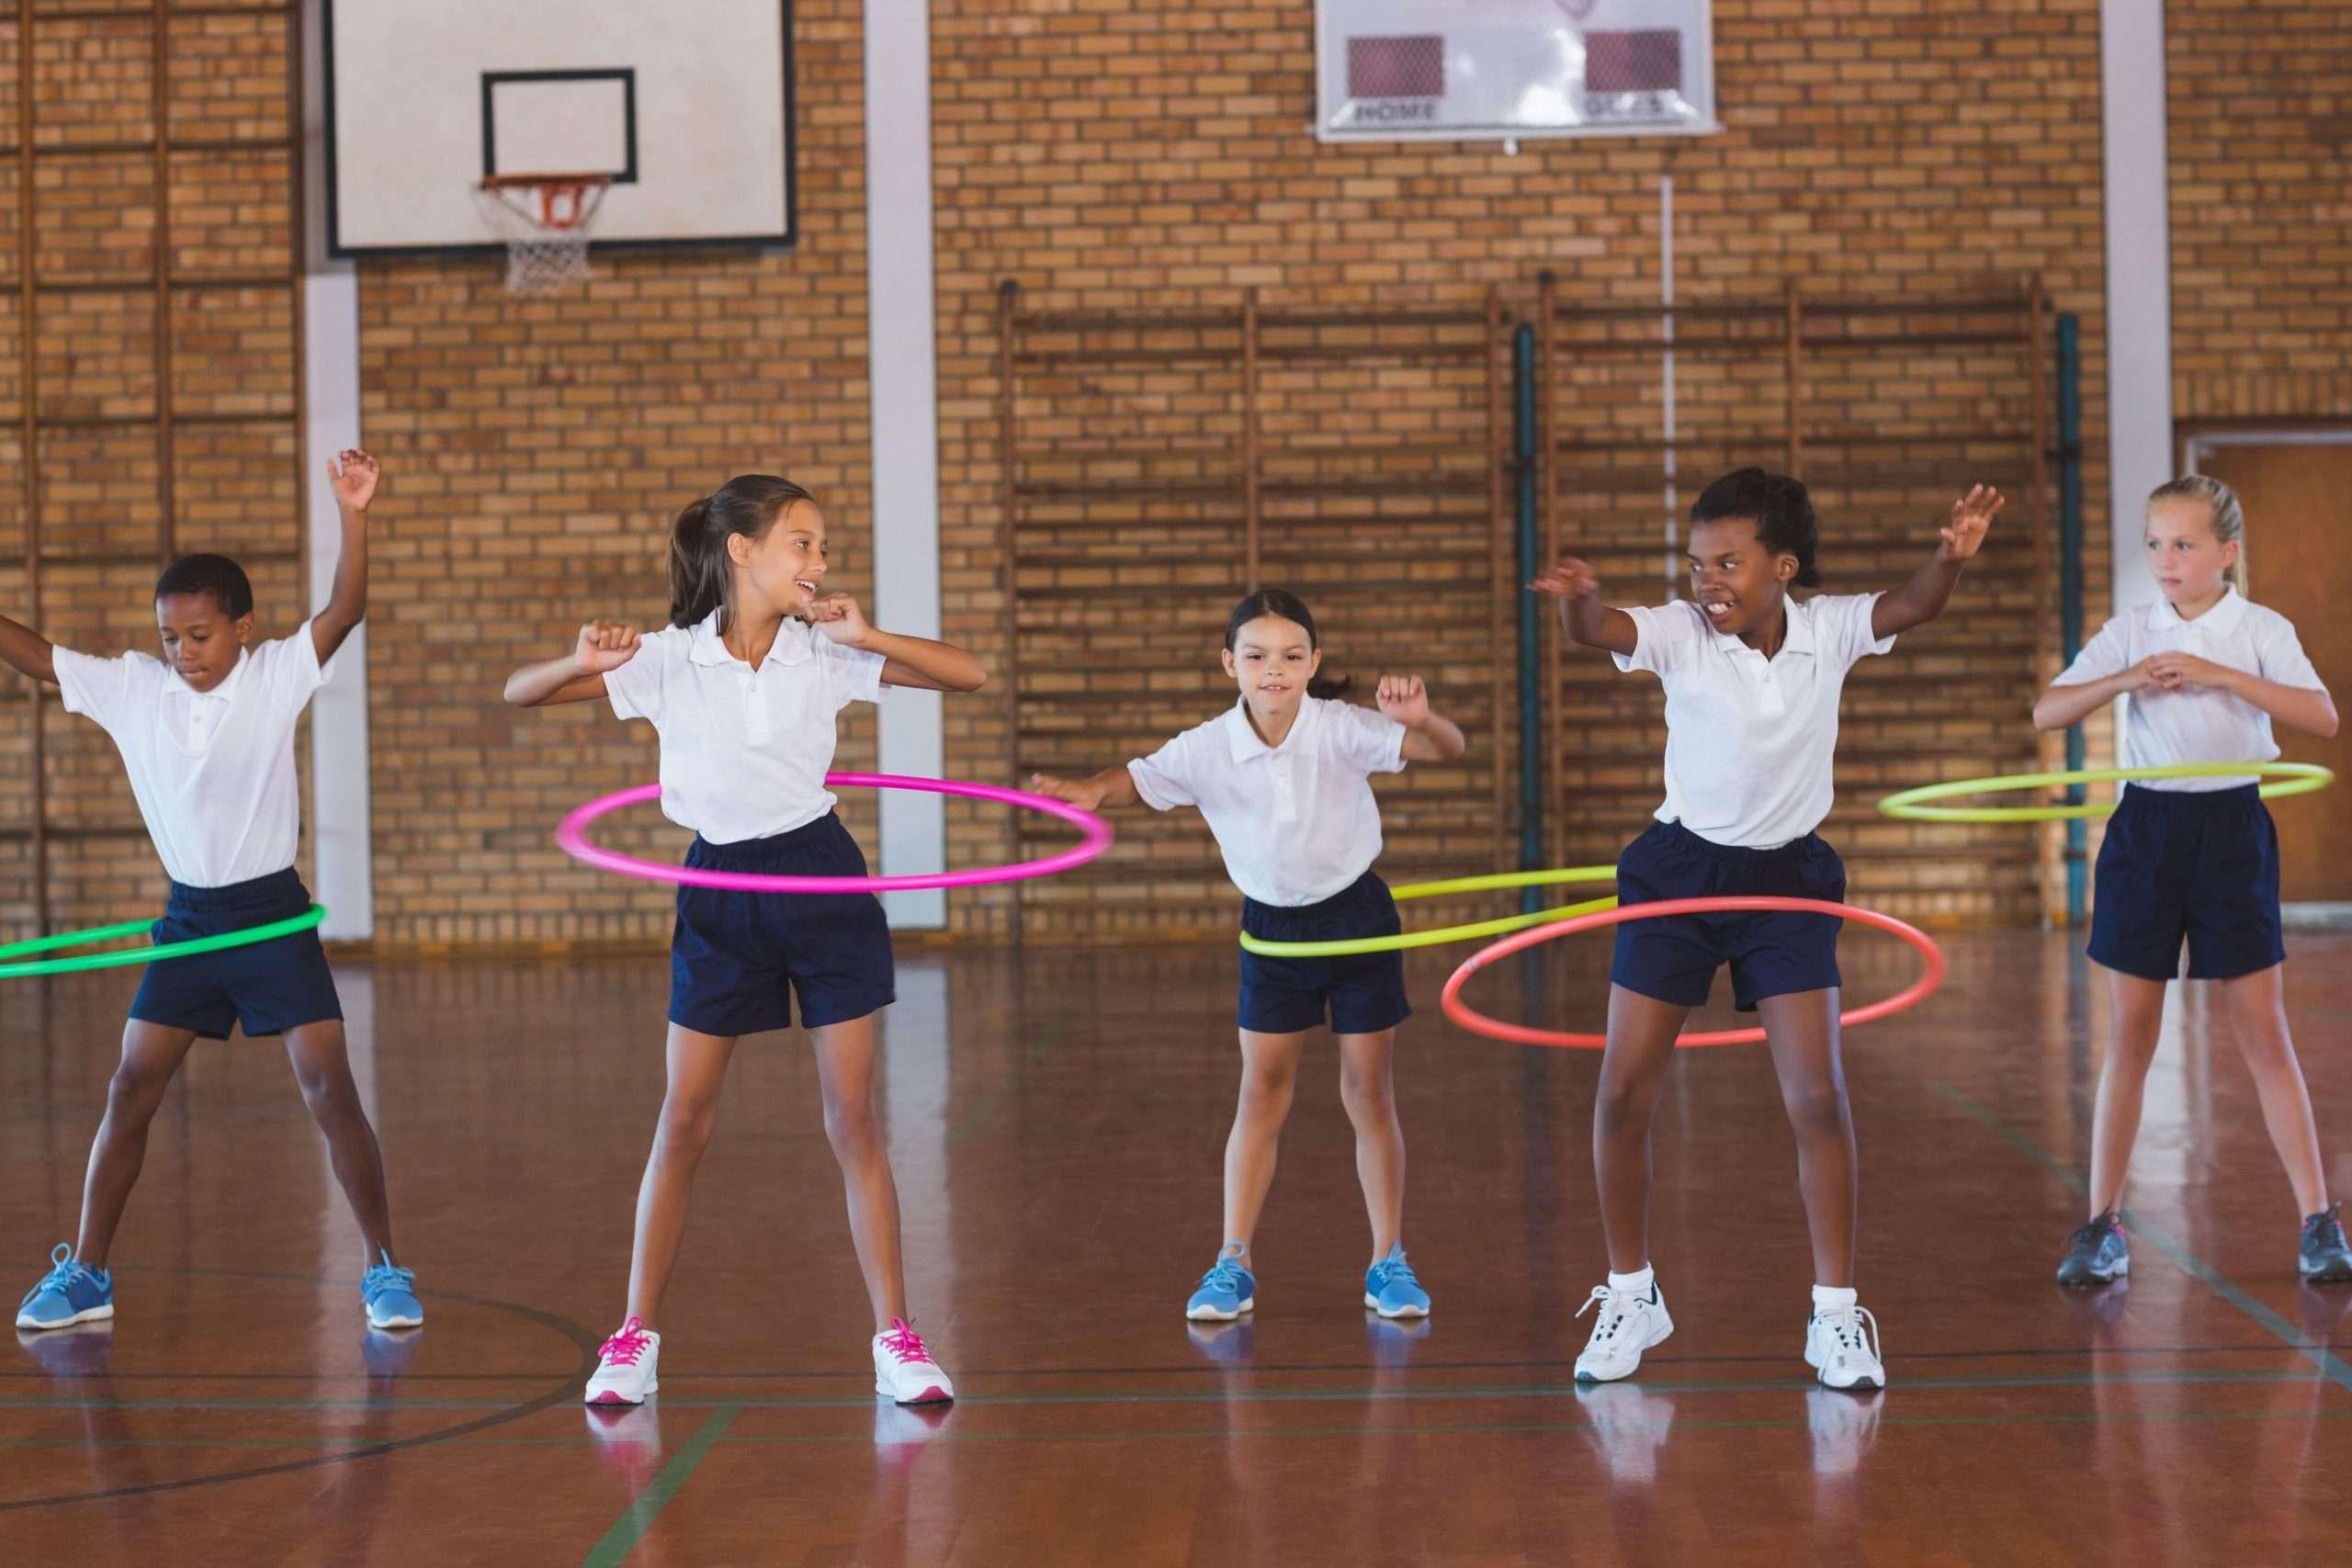 PE teachers, school sports coach, after school clubs, sports day, primary school teachers, sports coaching schools, extra-curricular clubs